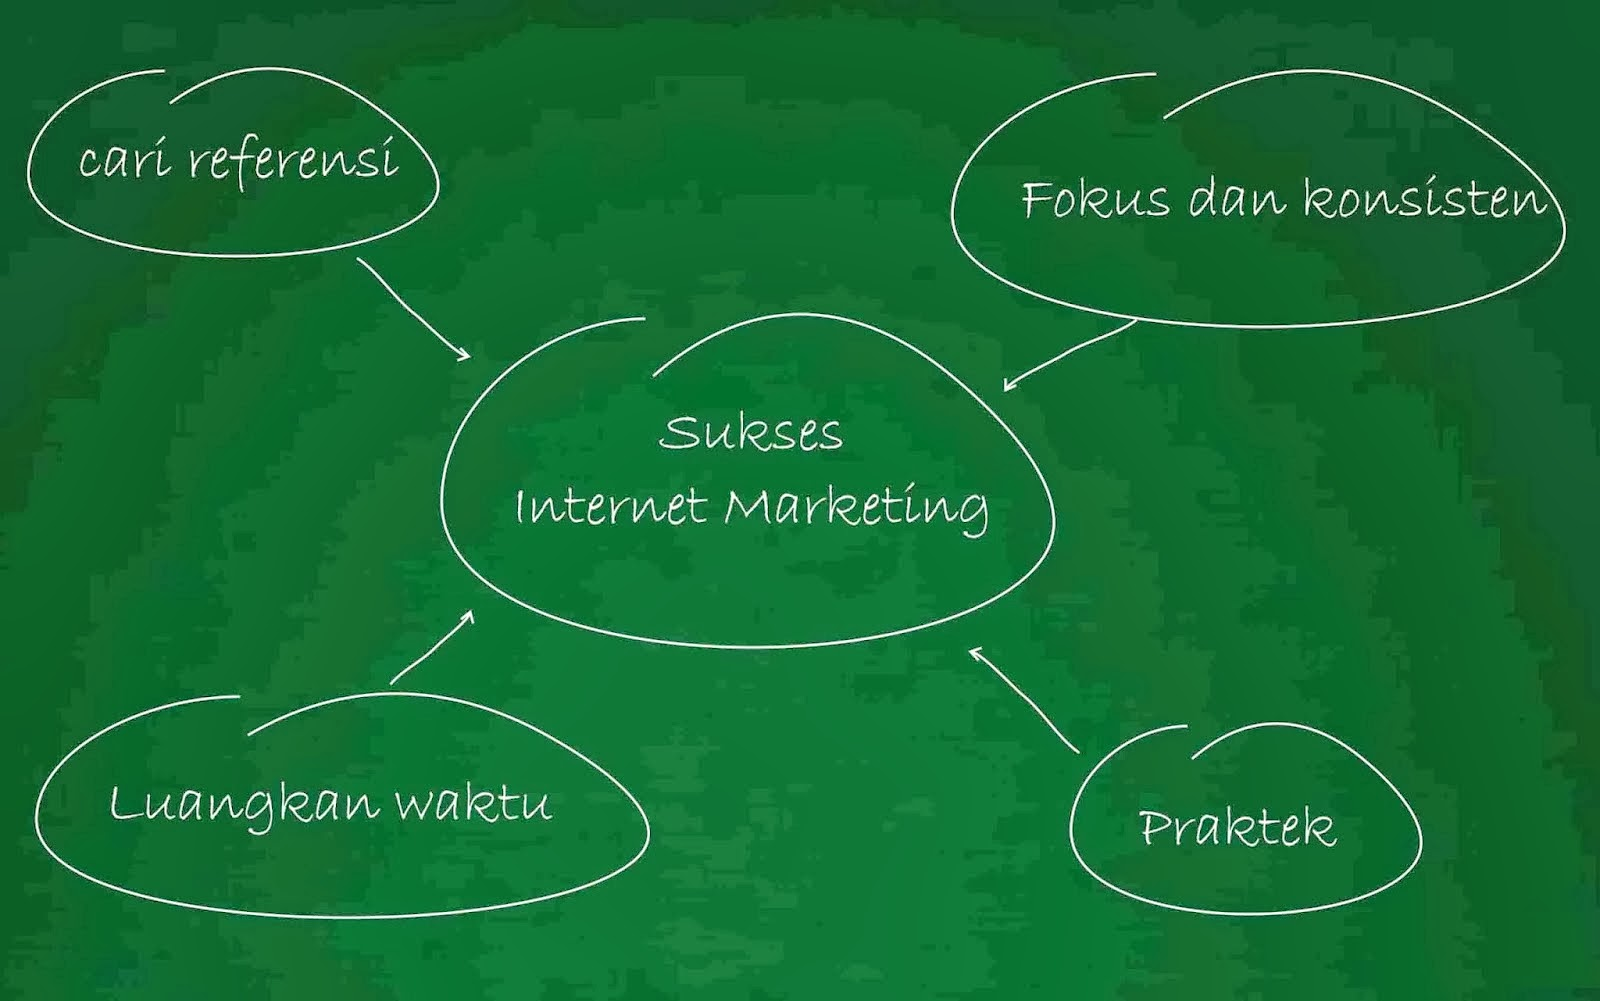 Belajar Jenis-Jenis Bisnis Online Internet Marketing ...